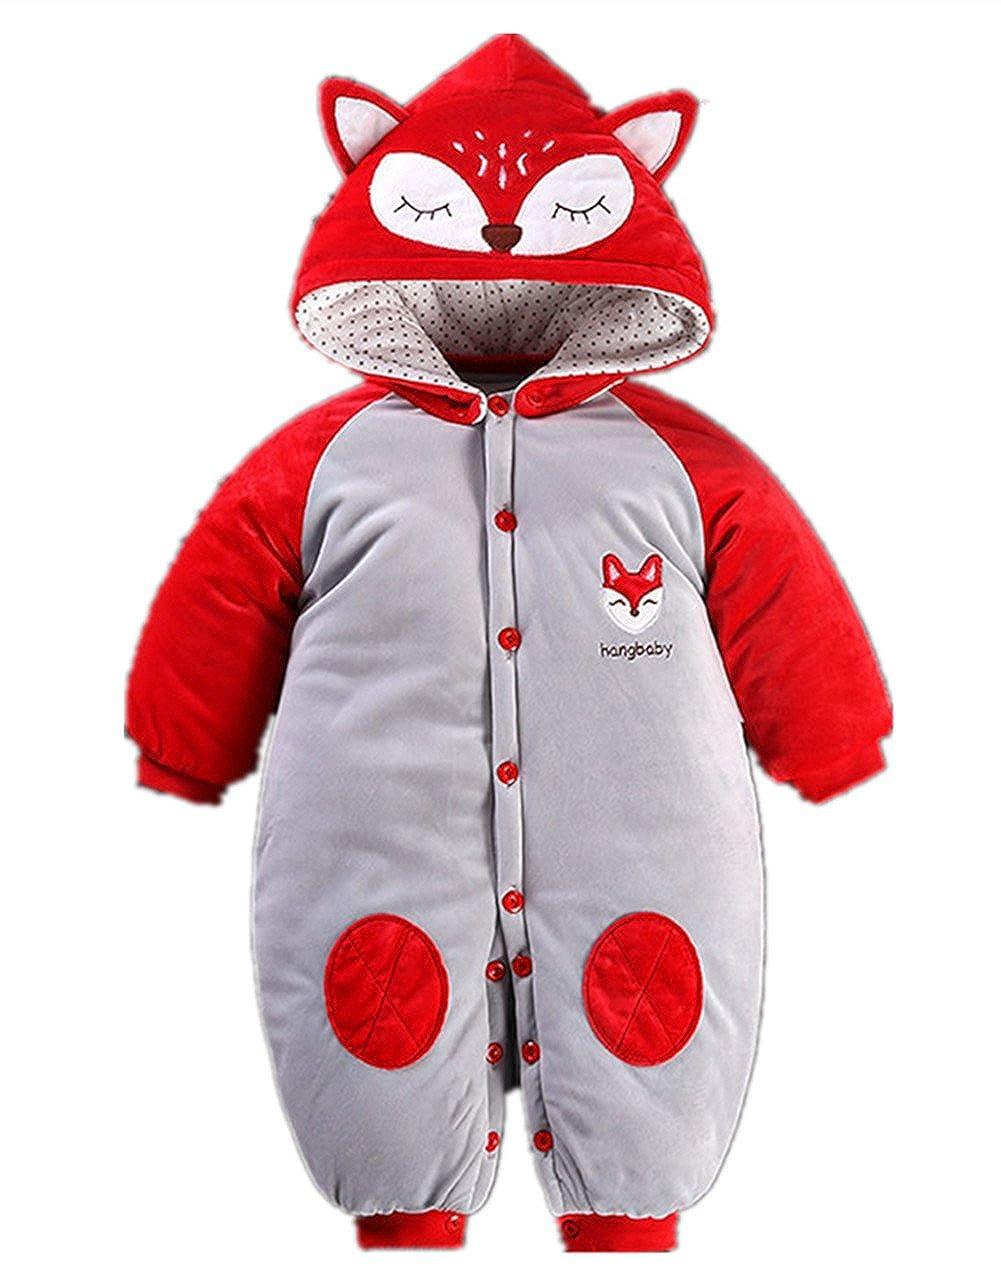 Beide Toddler Baby Boys Girls Cartoon Animal Thick Romper Warm Bodysuit Playsuit for Autumn Winter